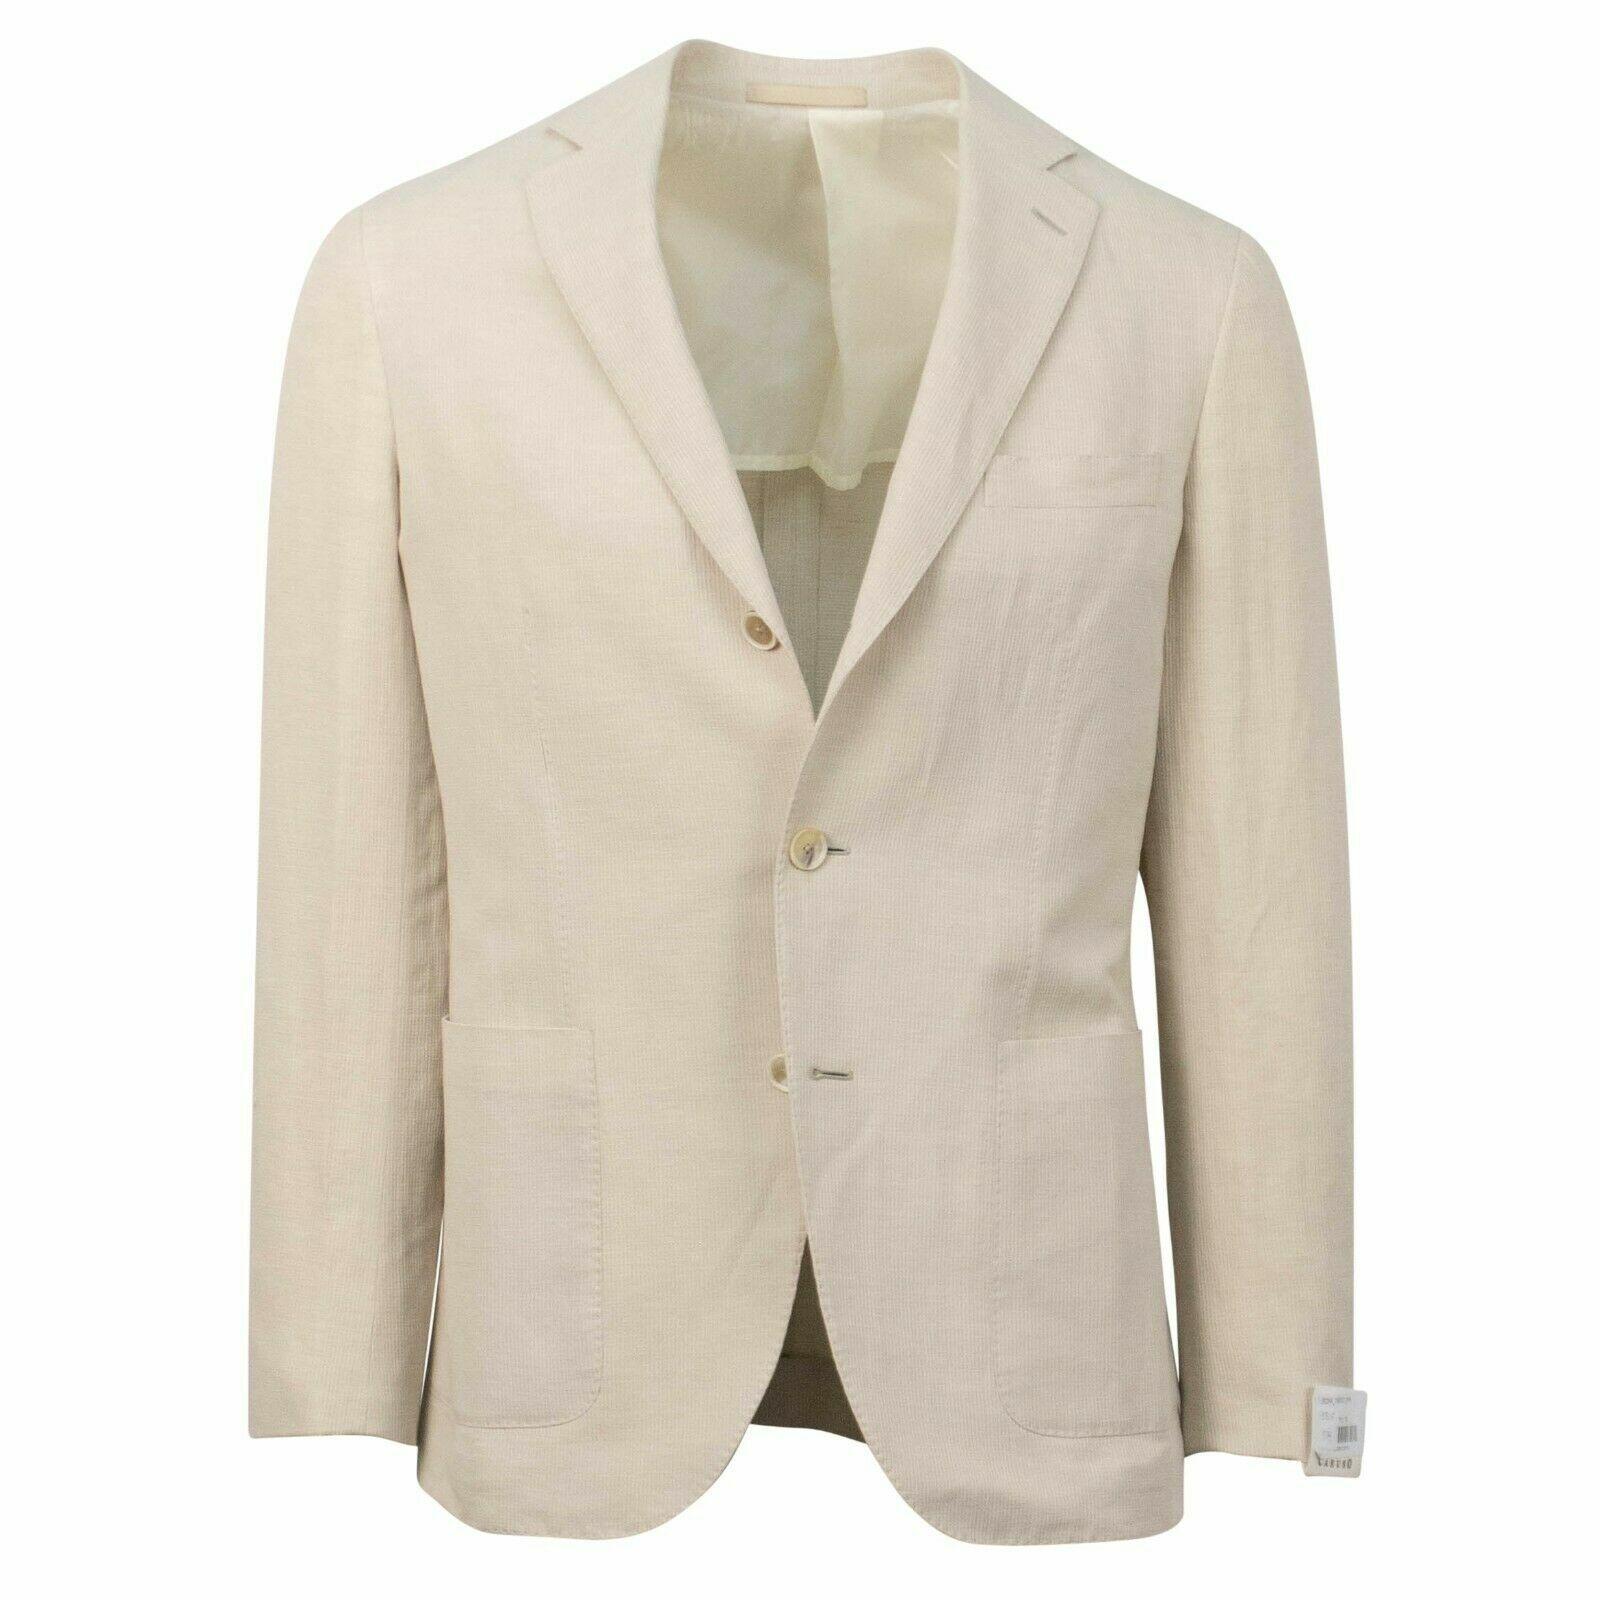 NWT CARUSO Tan Linen Blend 3 Roll 2 Button Sport Coat 46 36 R Drop 8